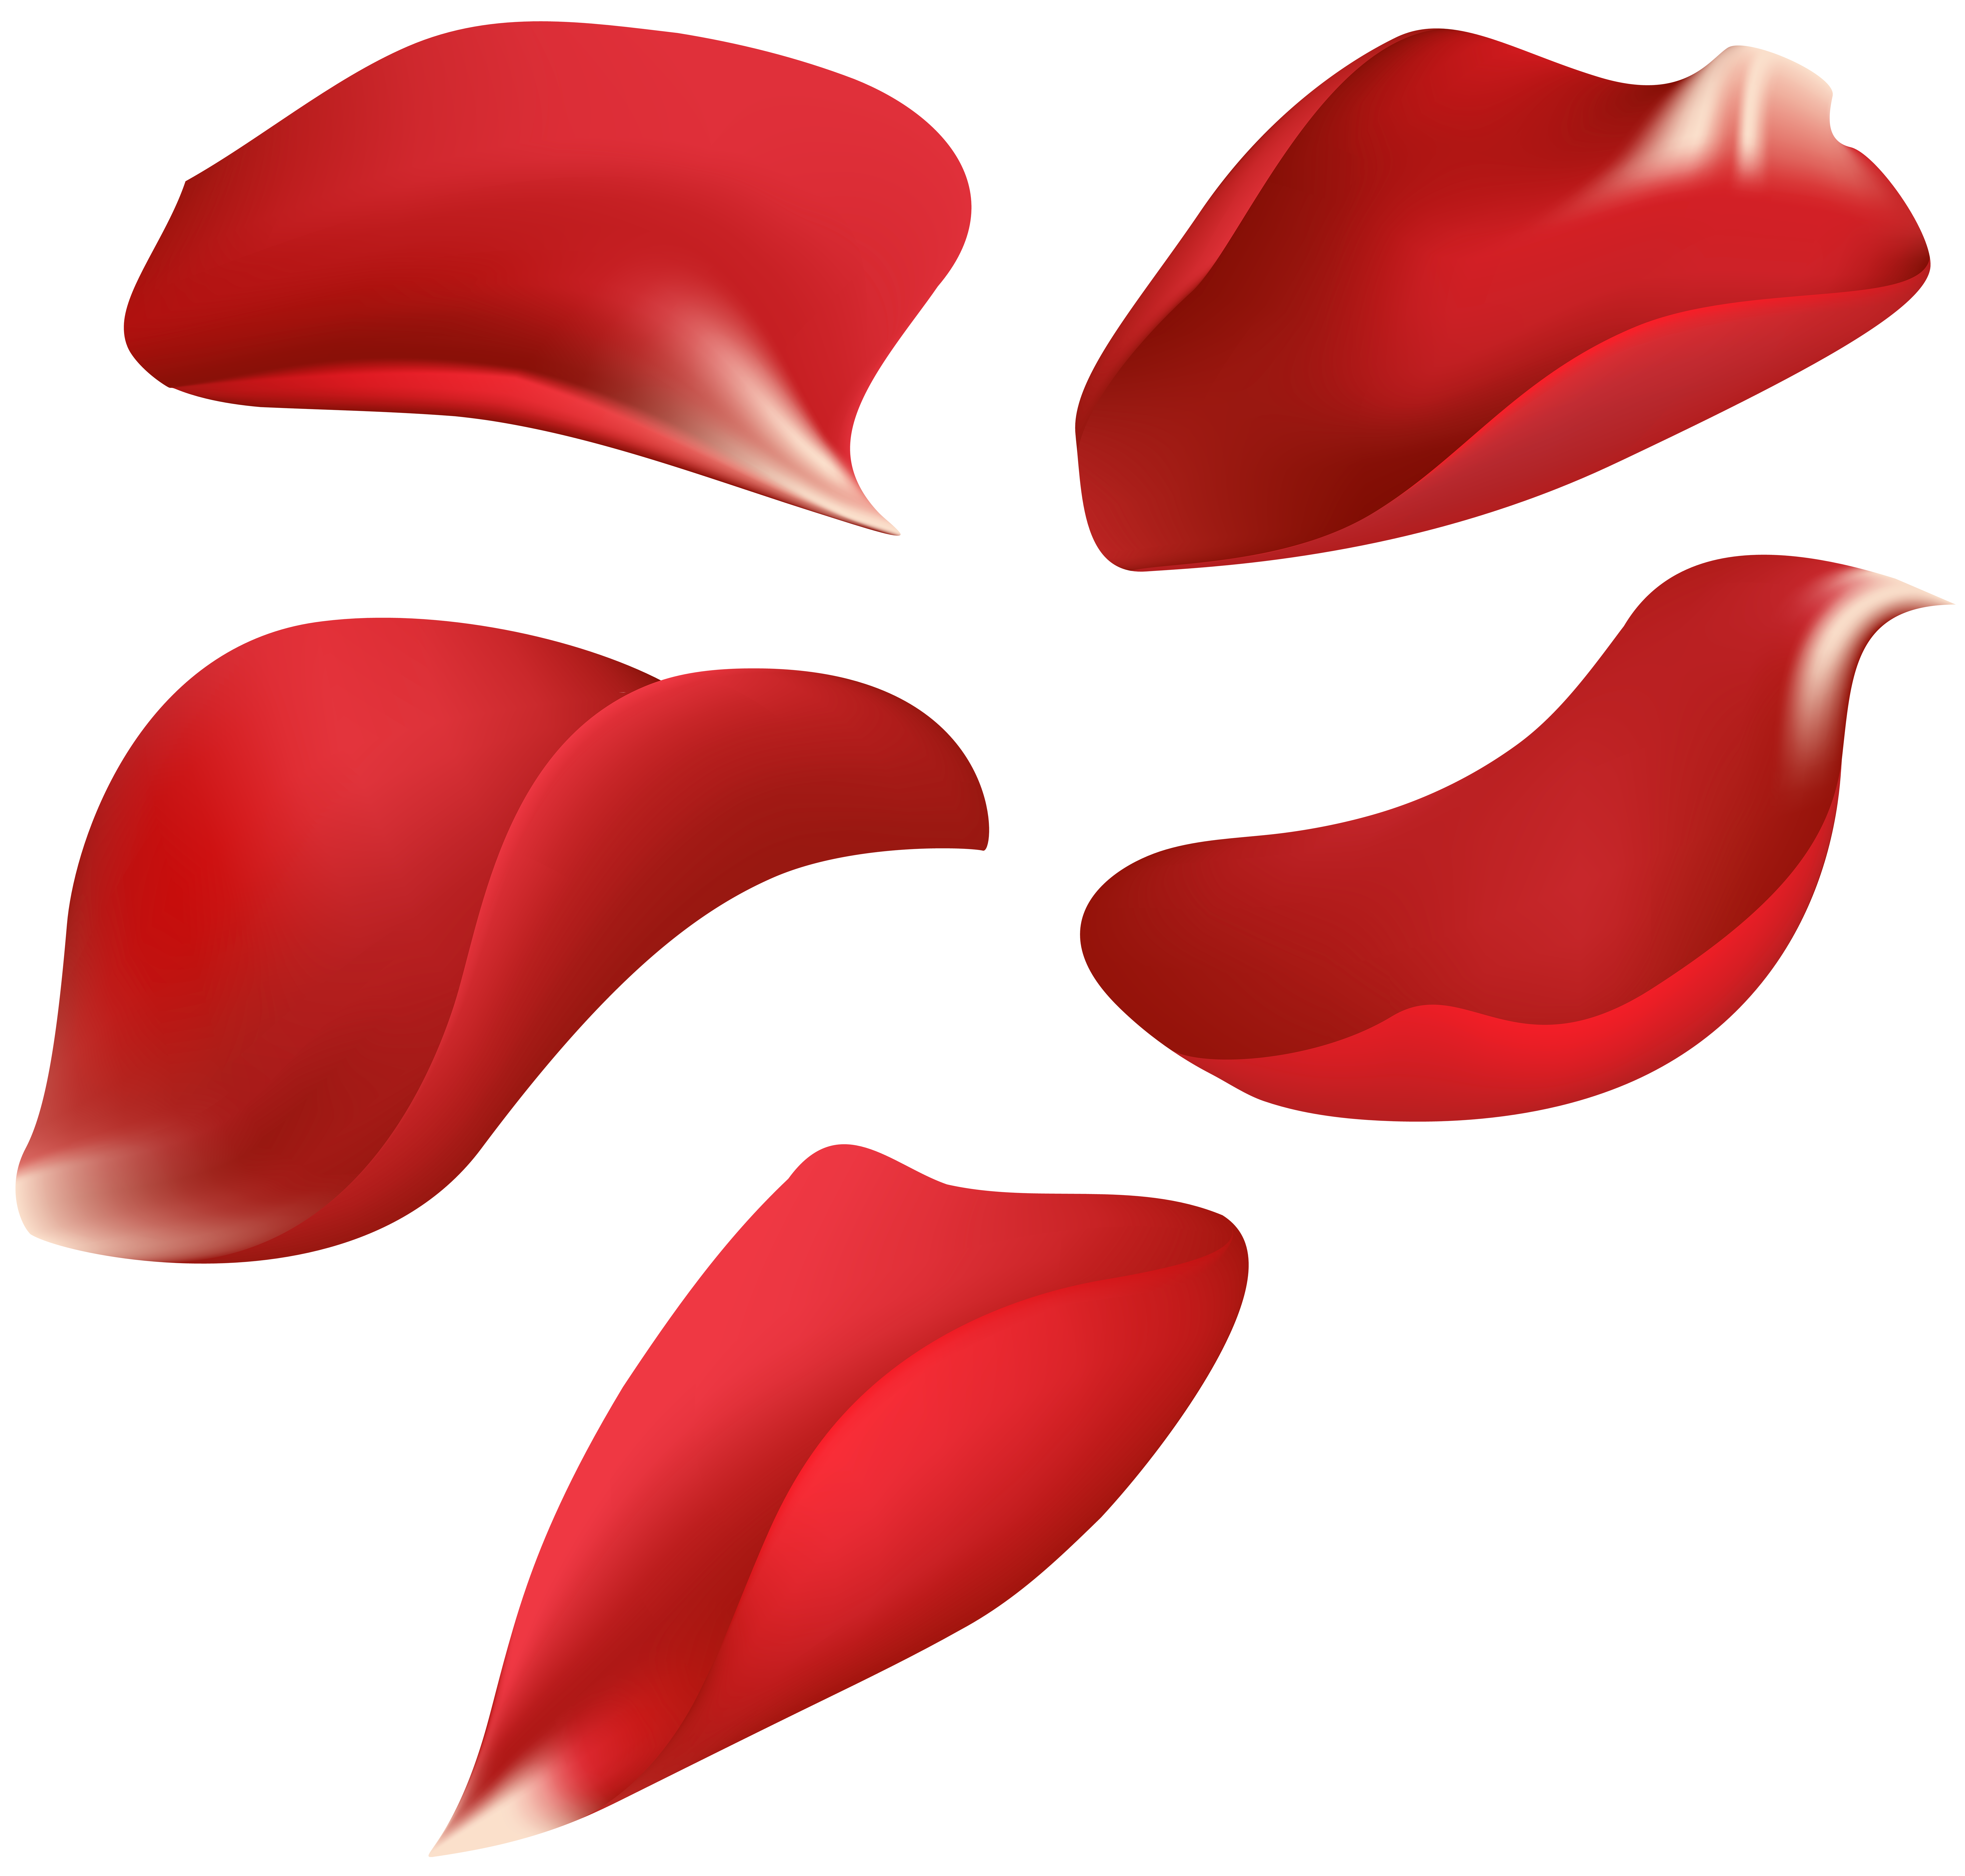 Red Rose Petals Transparent Clip Art Image | Gallery Yopriceville ...